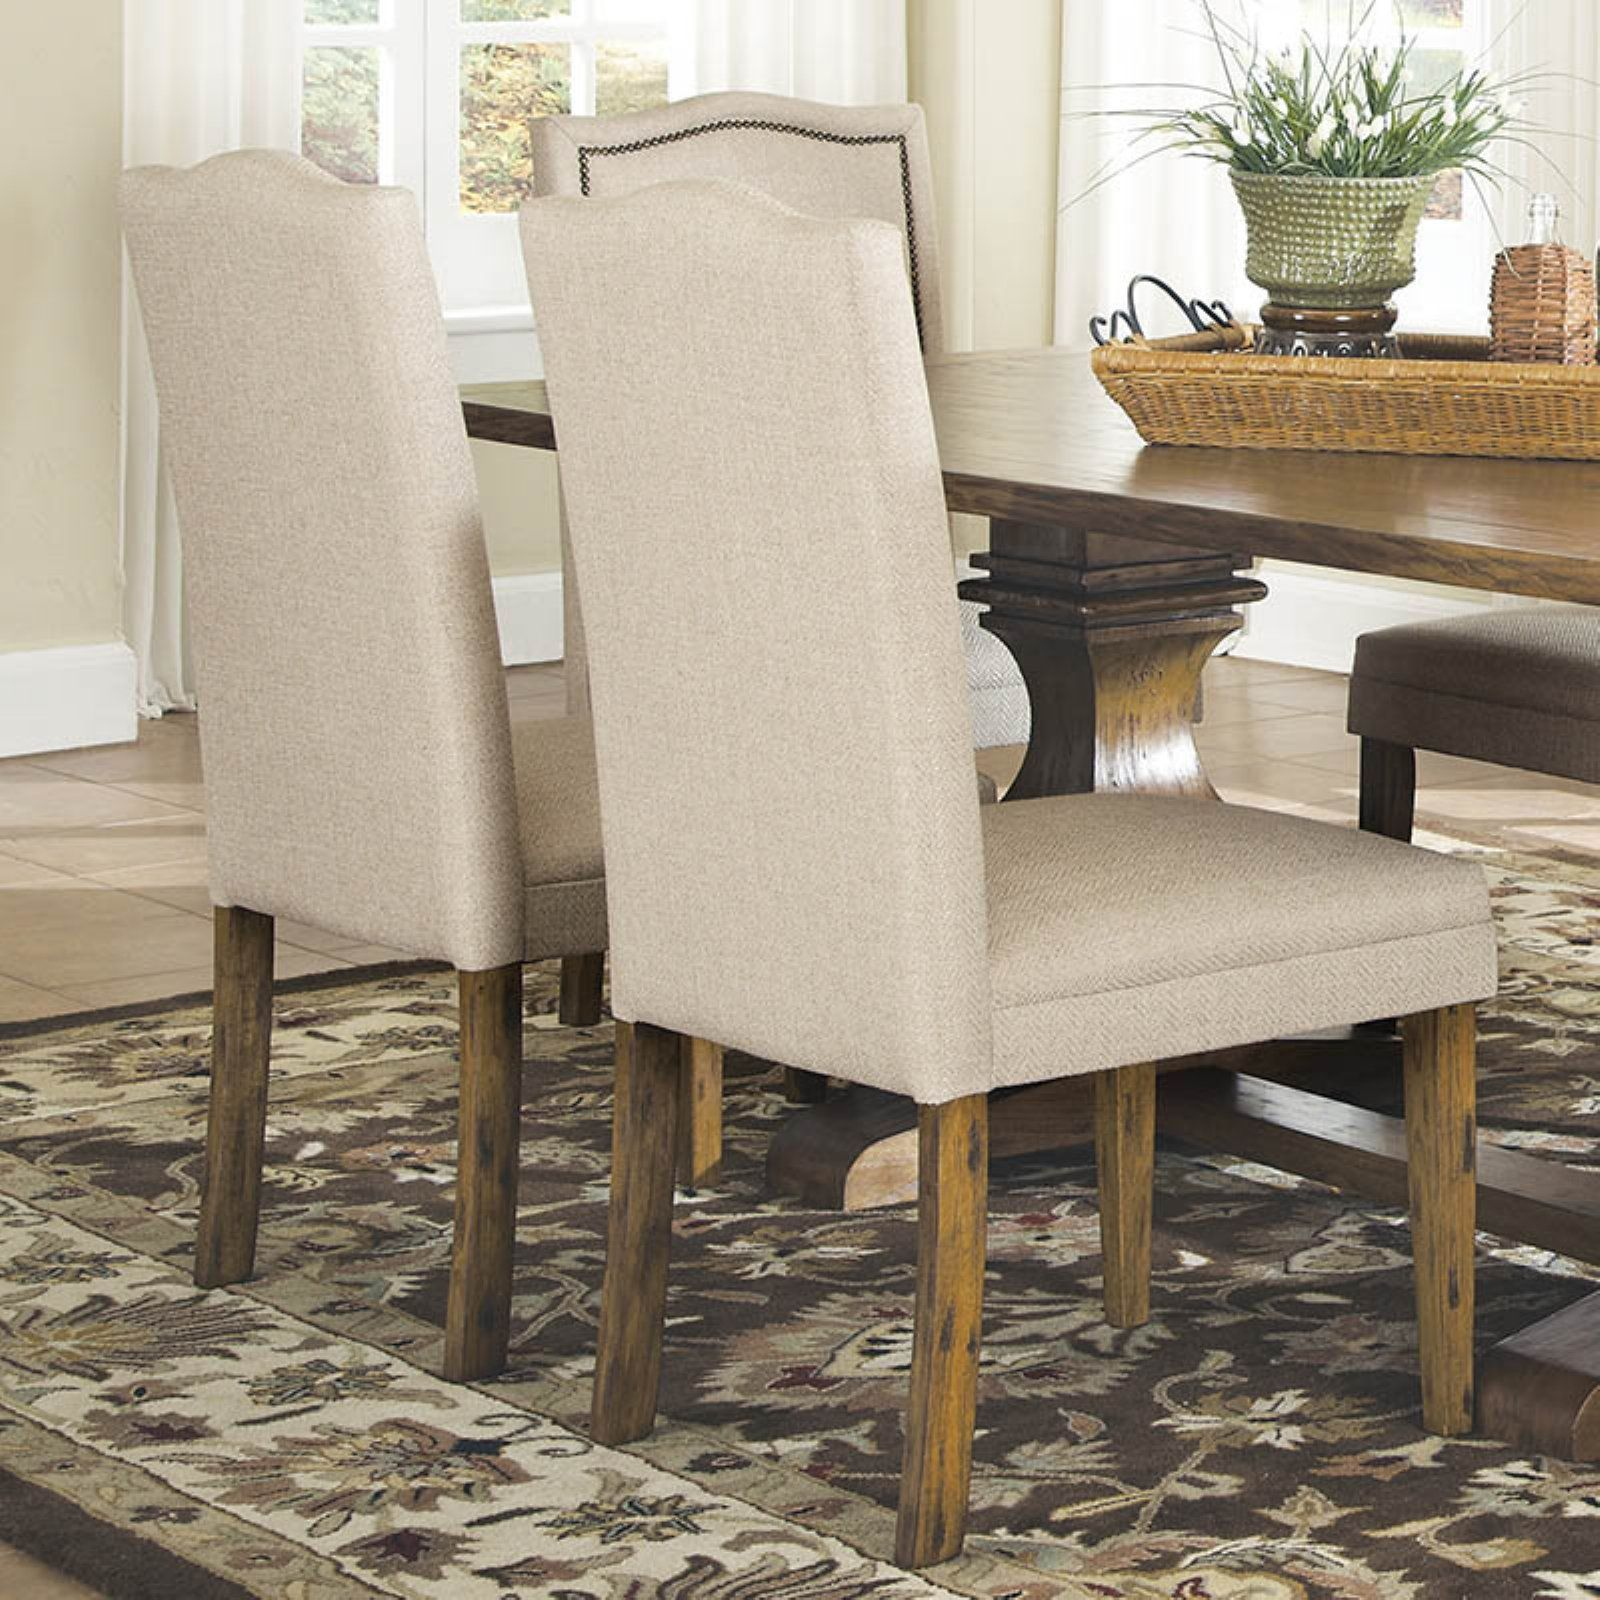 Coaster Furniture Parkins High Back Dining Side Chair ...